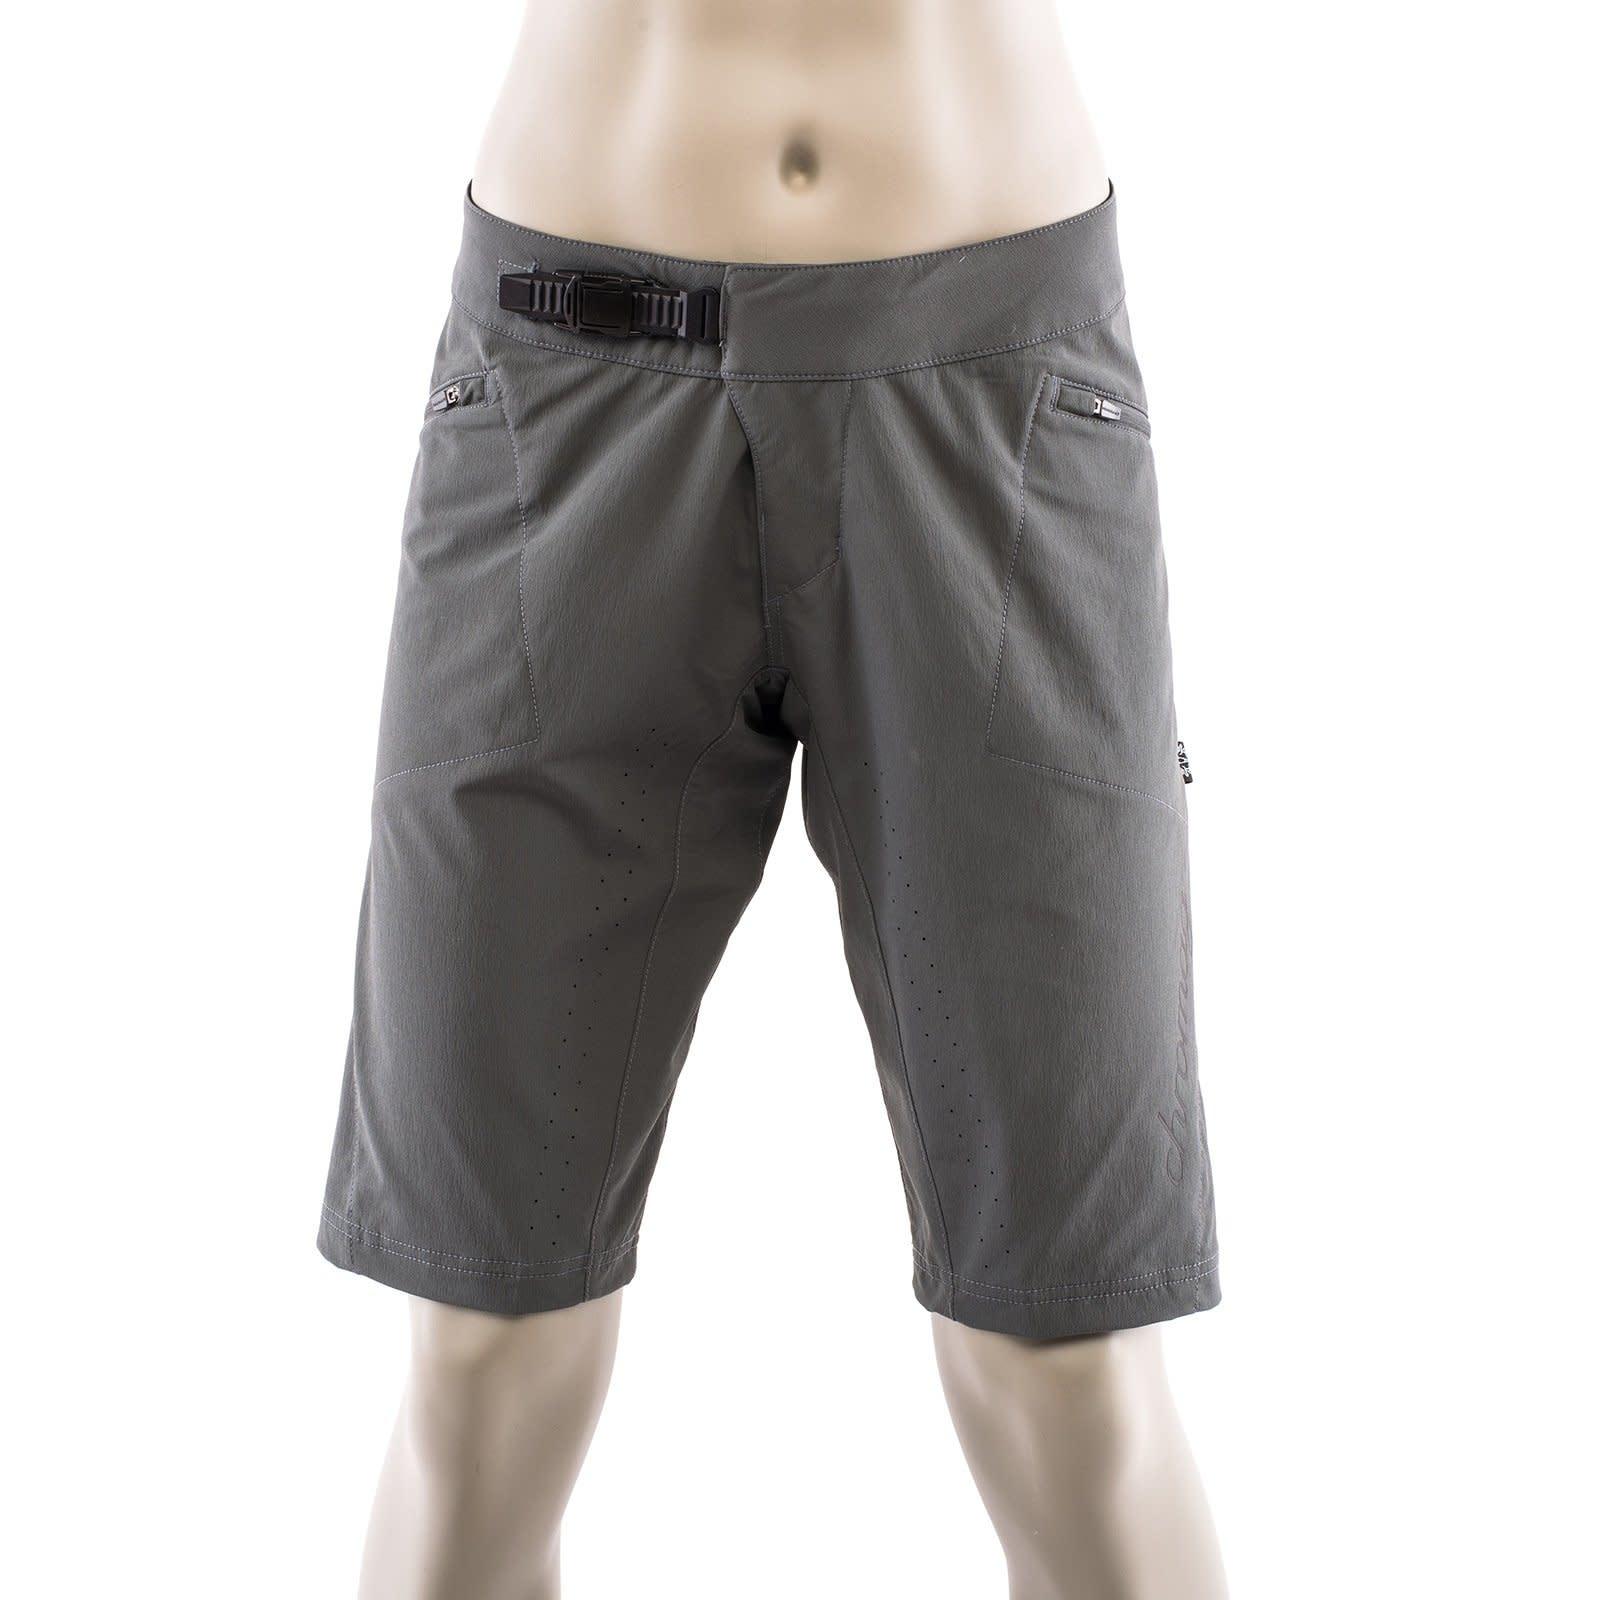 Chromag Shorts, Chromag Apparel Women's Ambit